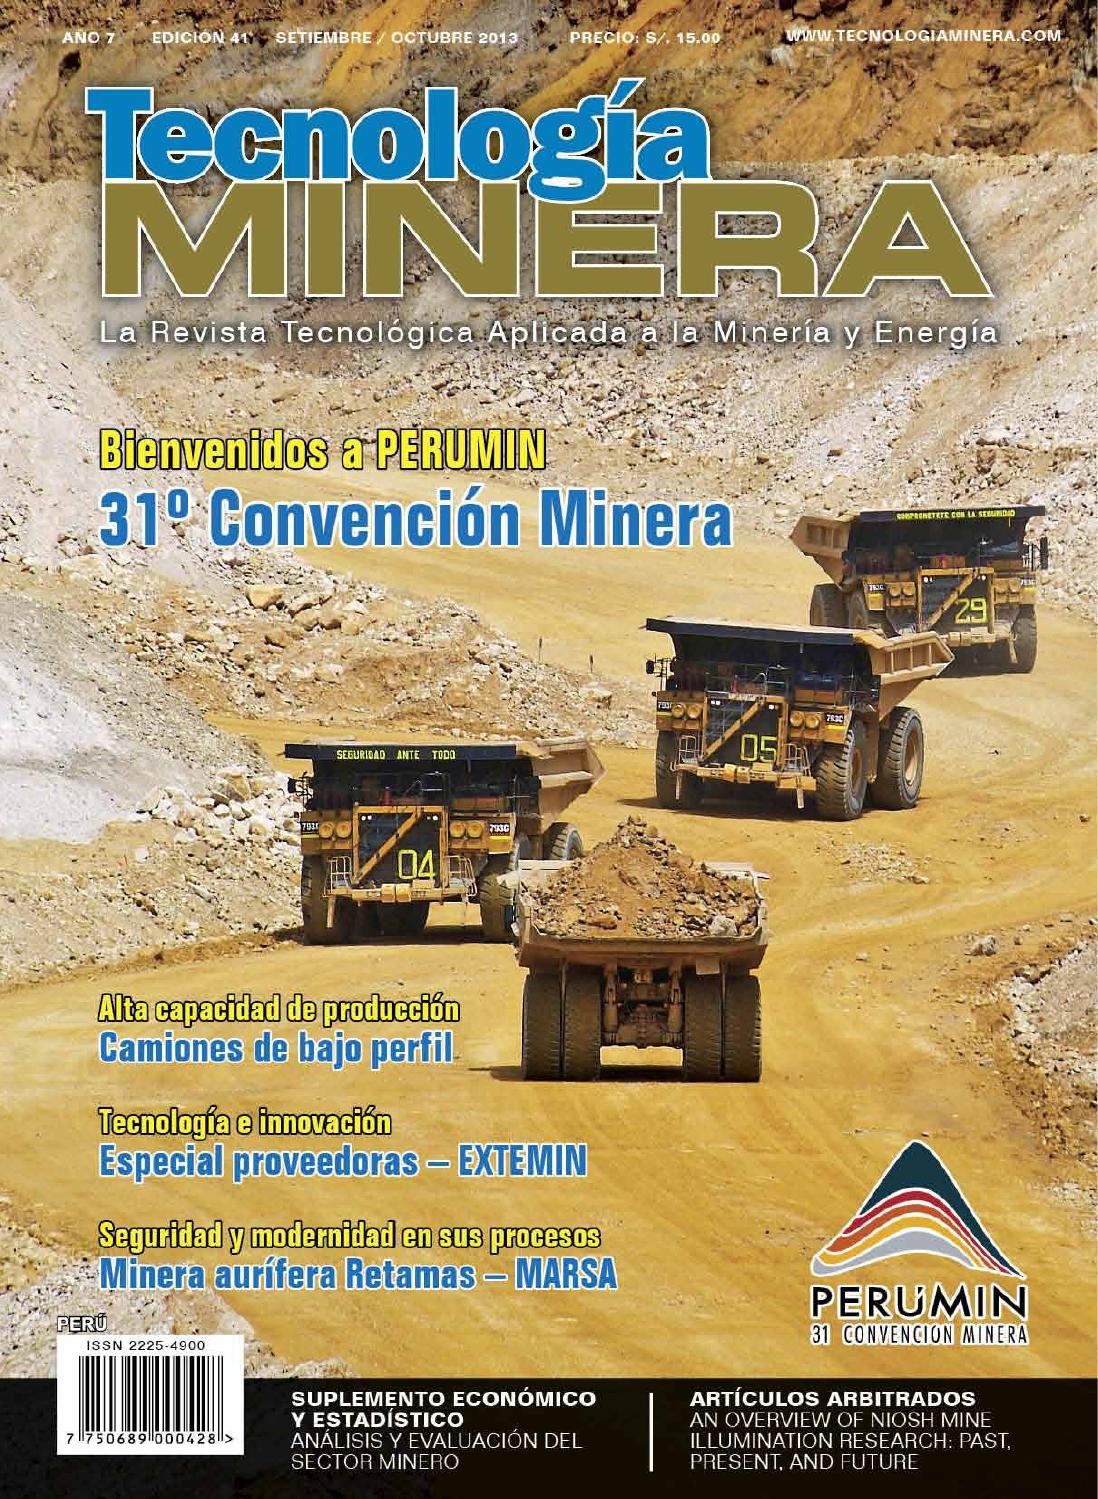 Tecnologia minera 41 02 by pull creativo - issuu